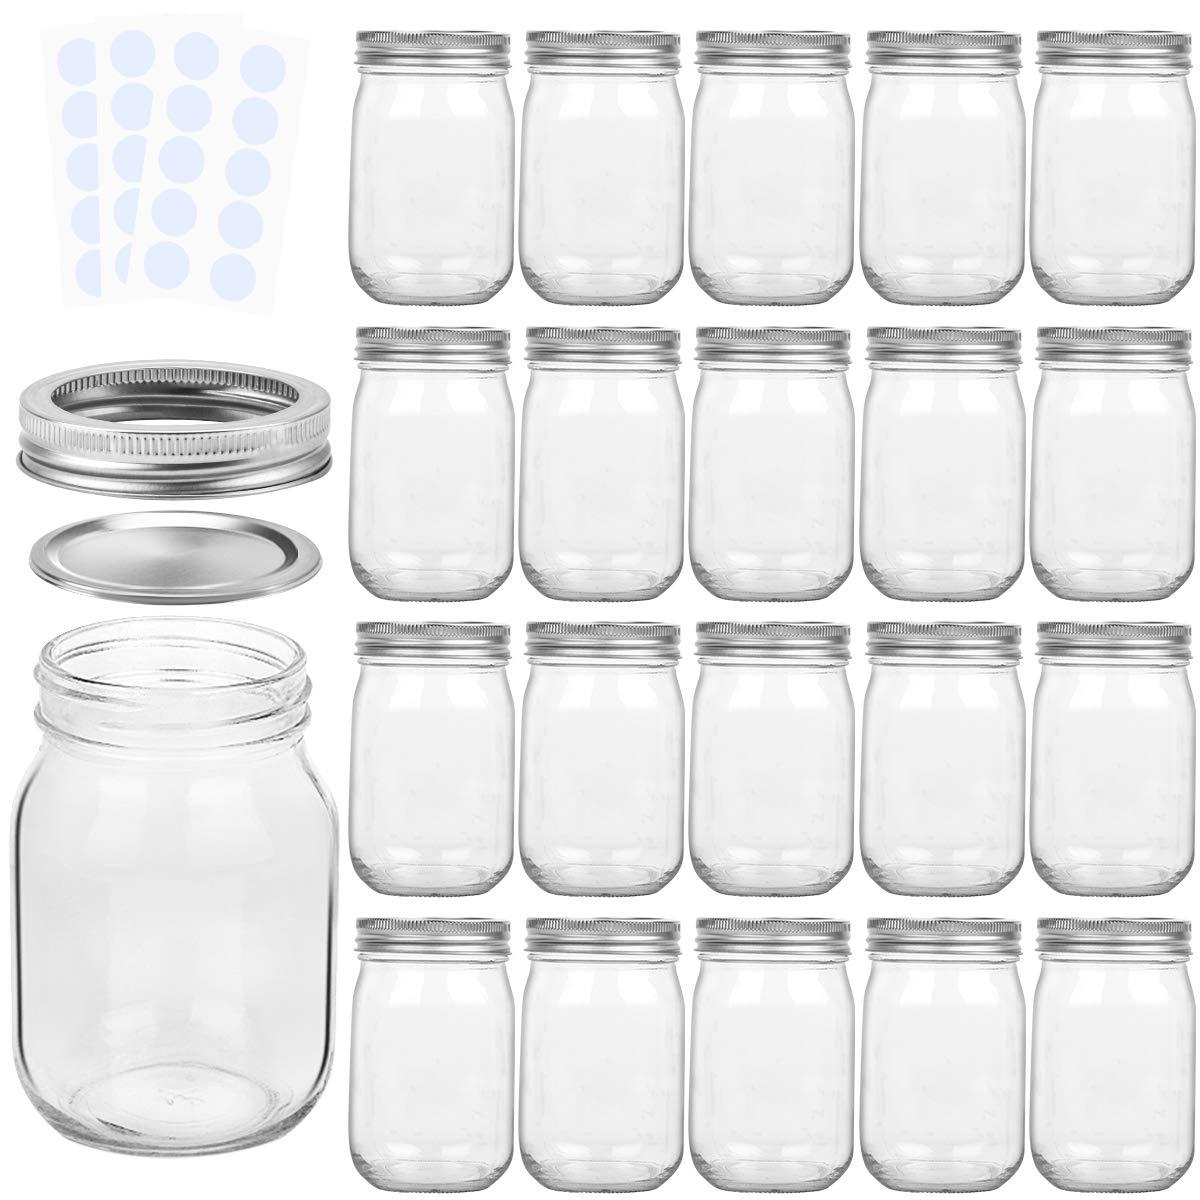 KAMOTA Mason Jars 12OZ With Regular Lids and Bands, Ideal for Jam, Honey, Wedding Favors, Shower Favors, Baby Foods, DIY Magnetic Spice Jars, 20 PACK, 30 Whiteboard Labels Included by KAMOTA (Image #1)